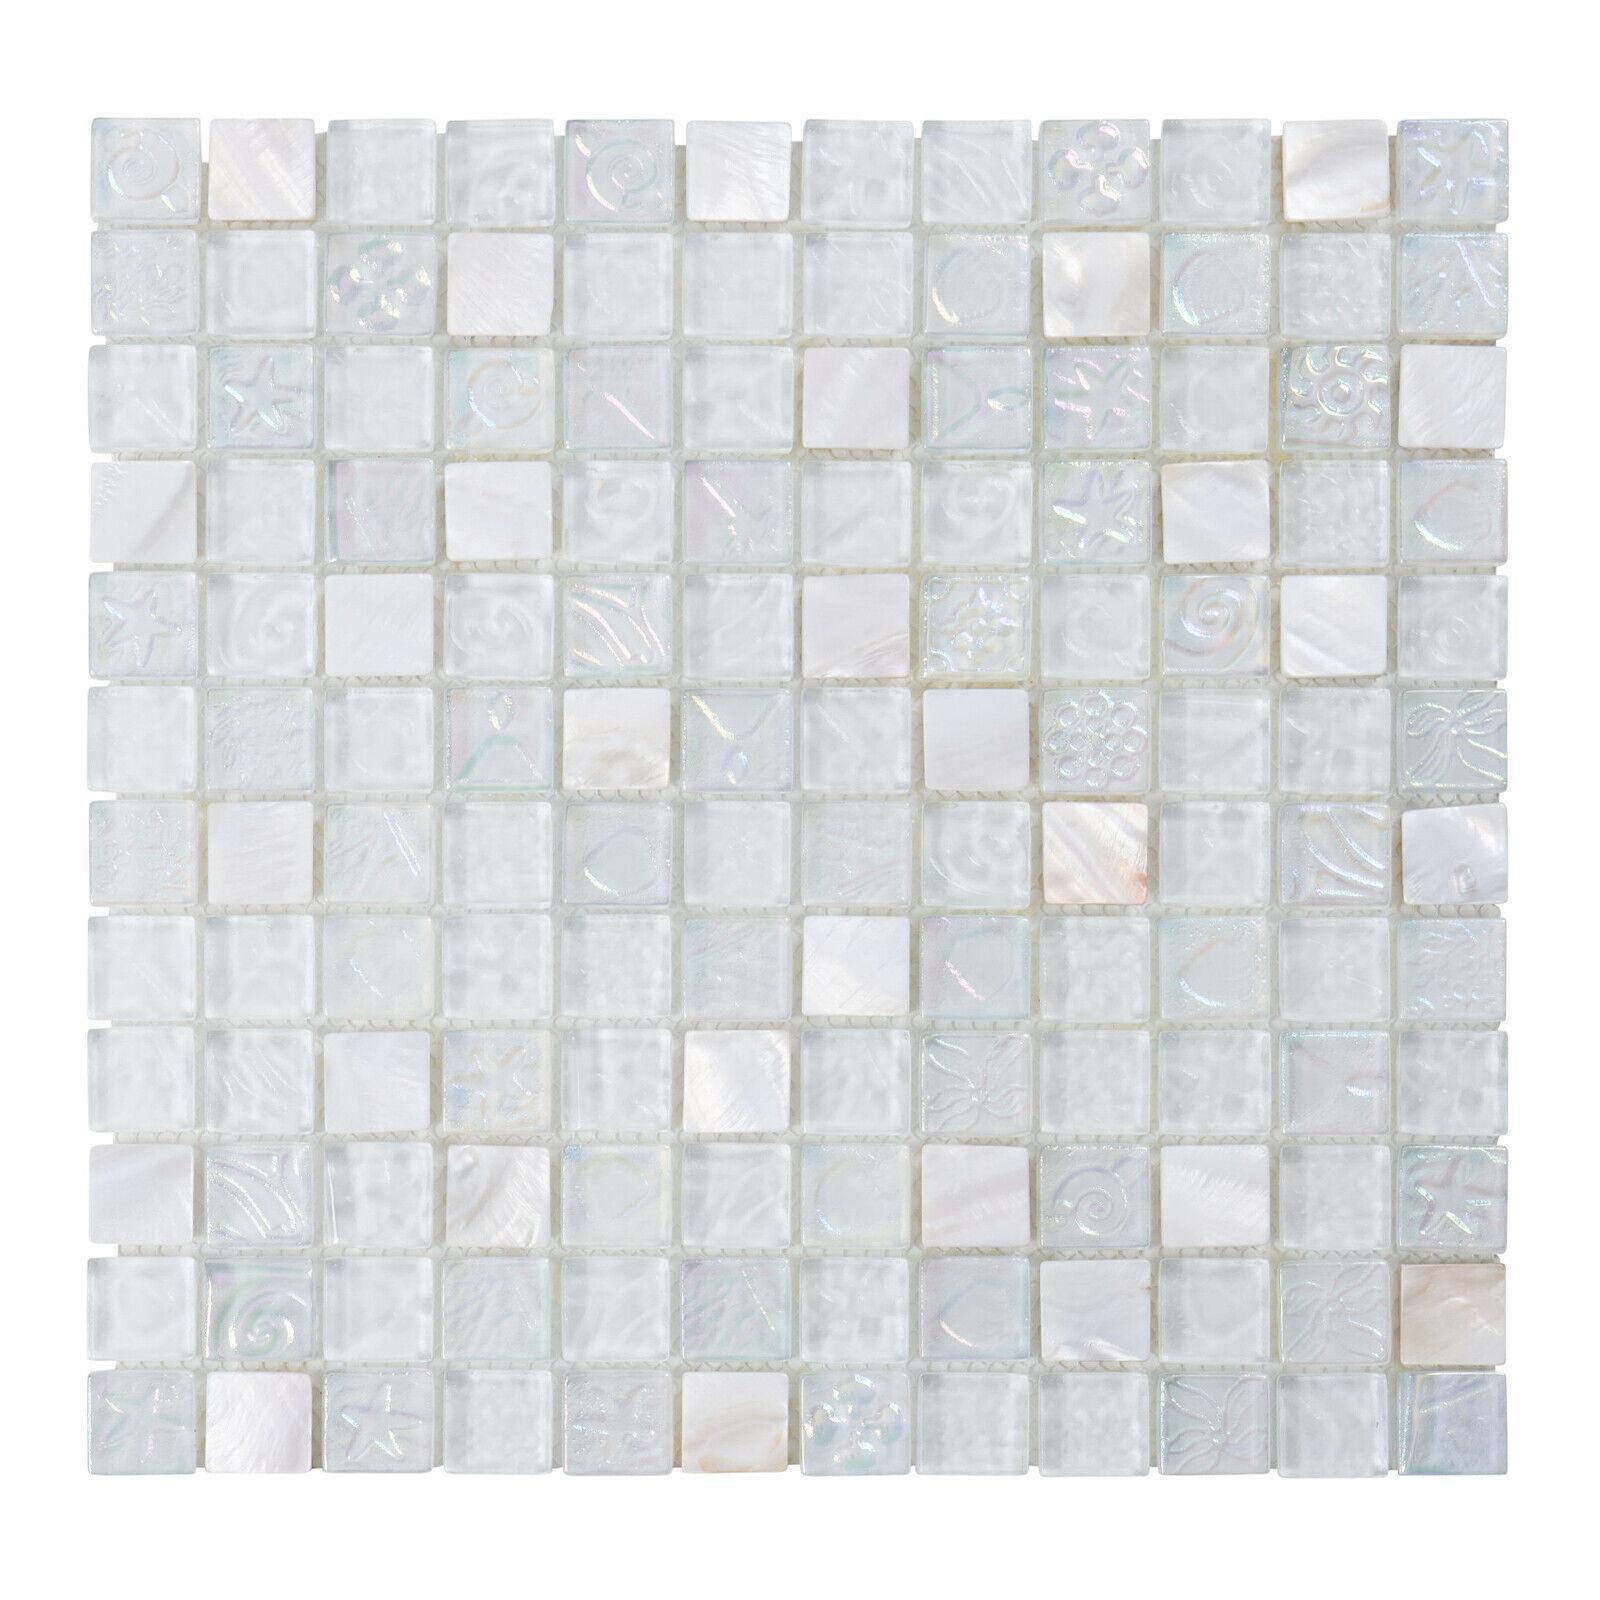 Image of: Sample Blue White Marble Glass Mosaic Tile Kitchen Backsplash Bath Wall Sink For Sale Online Ebay